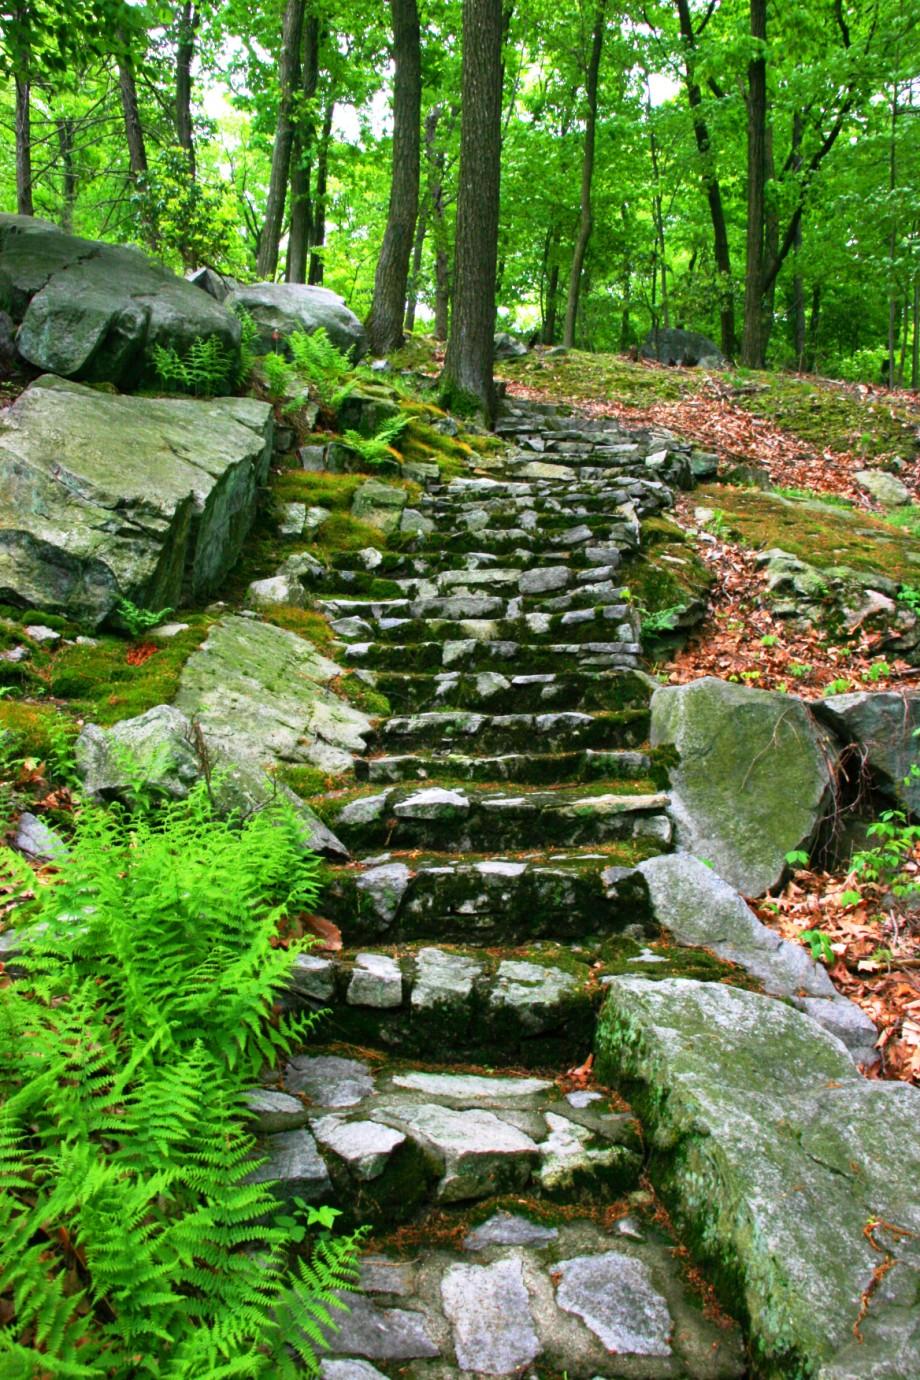 Russel Wrights Manitoga Amp Dragon Rock Historic